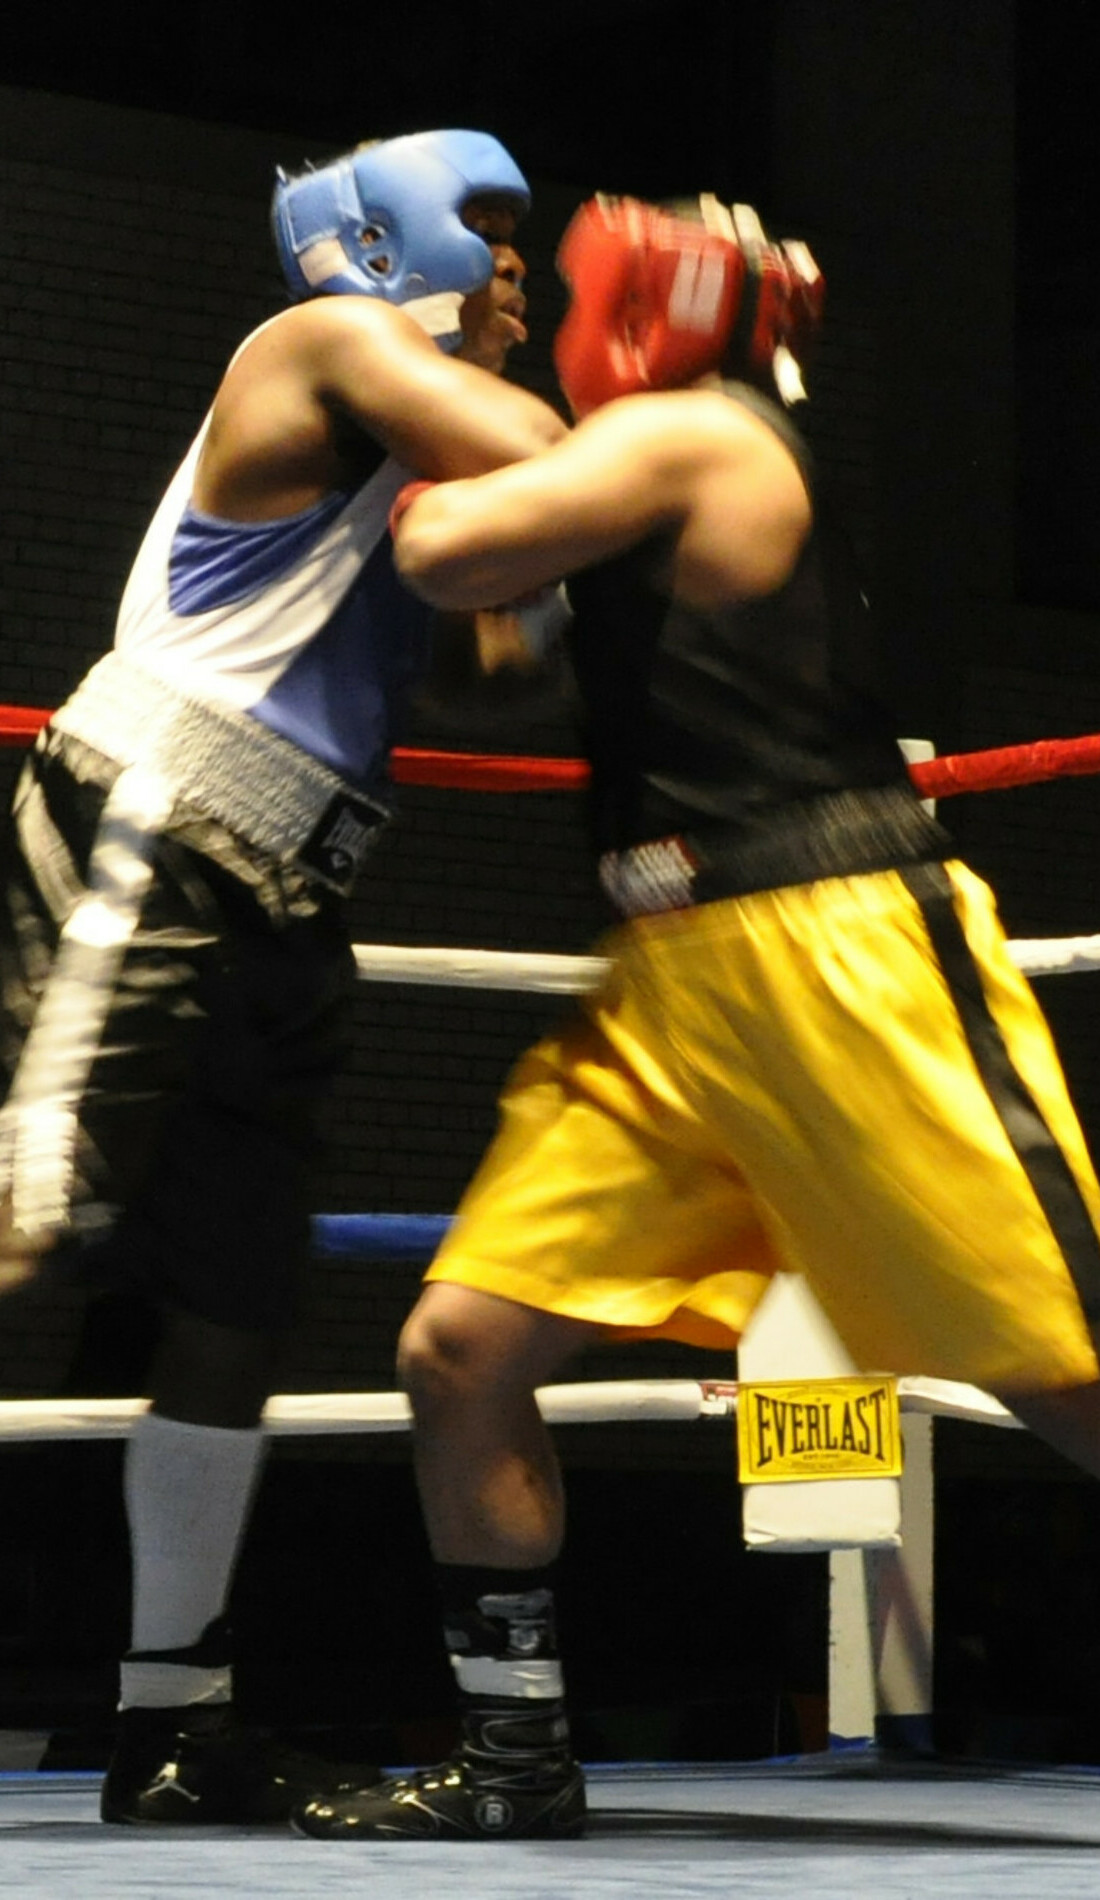 A Thunderbolt Boxing live event